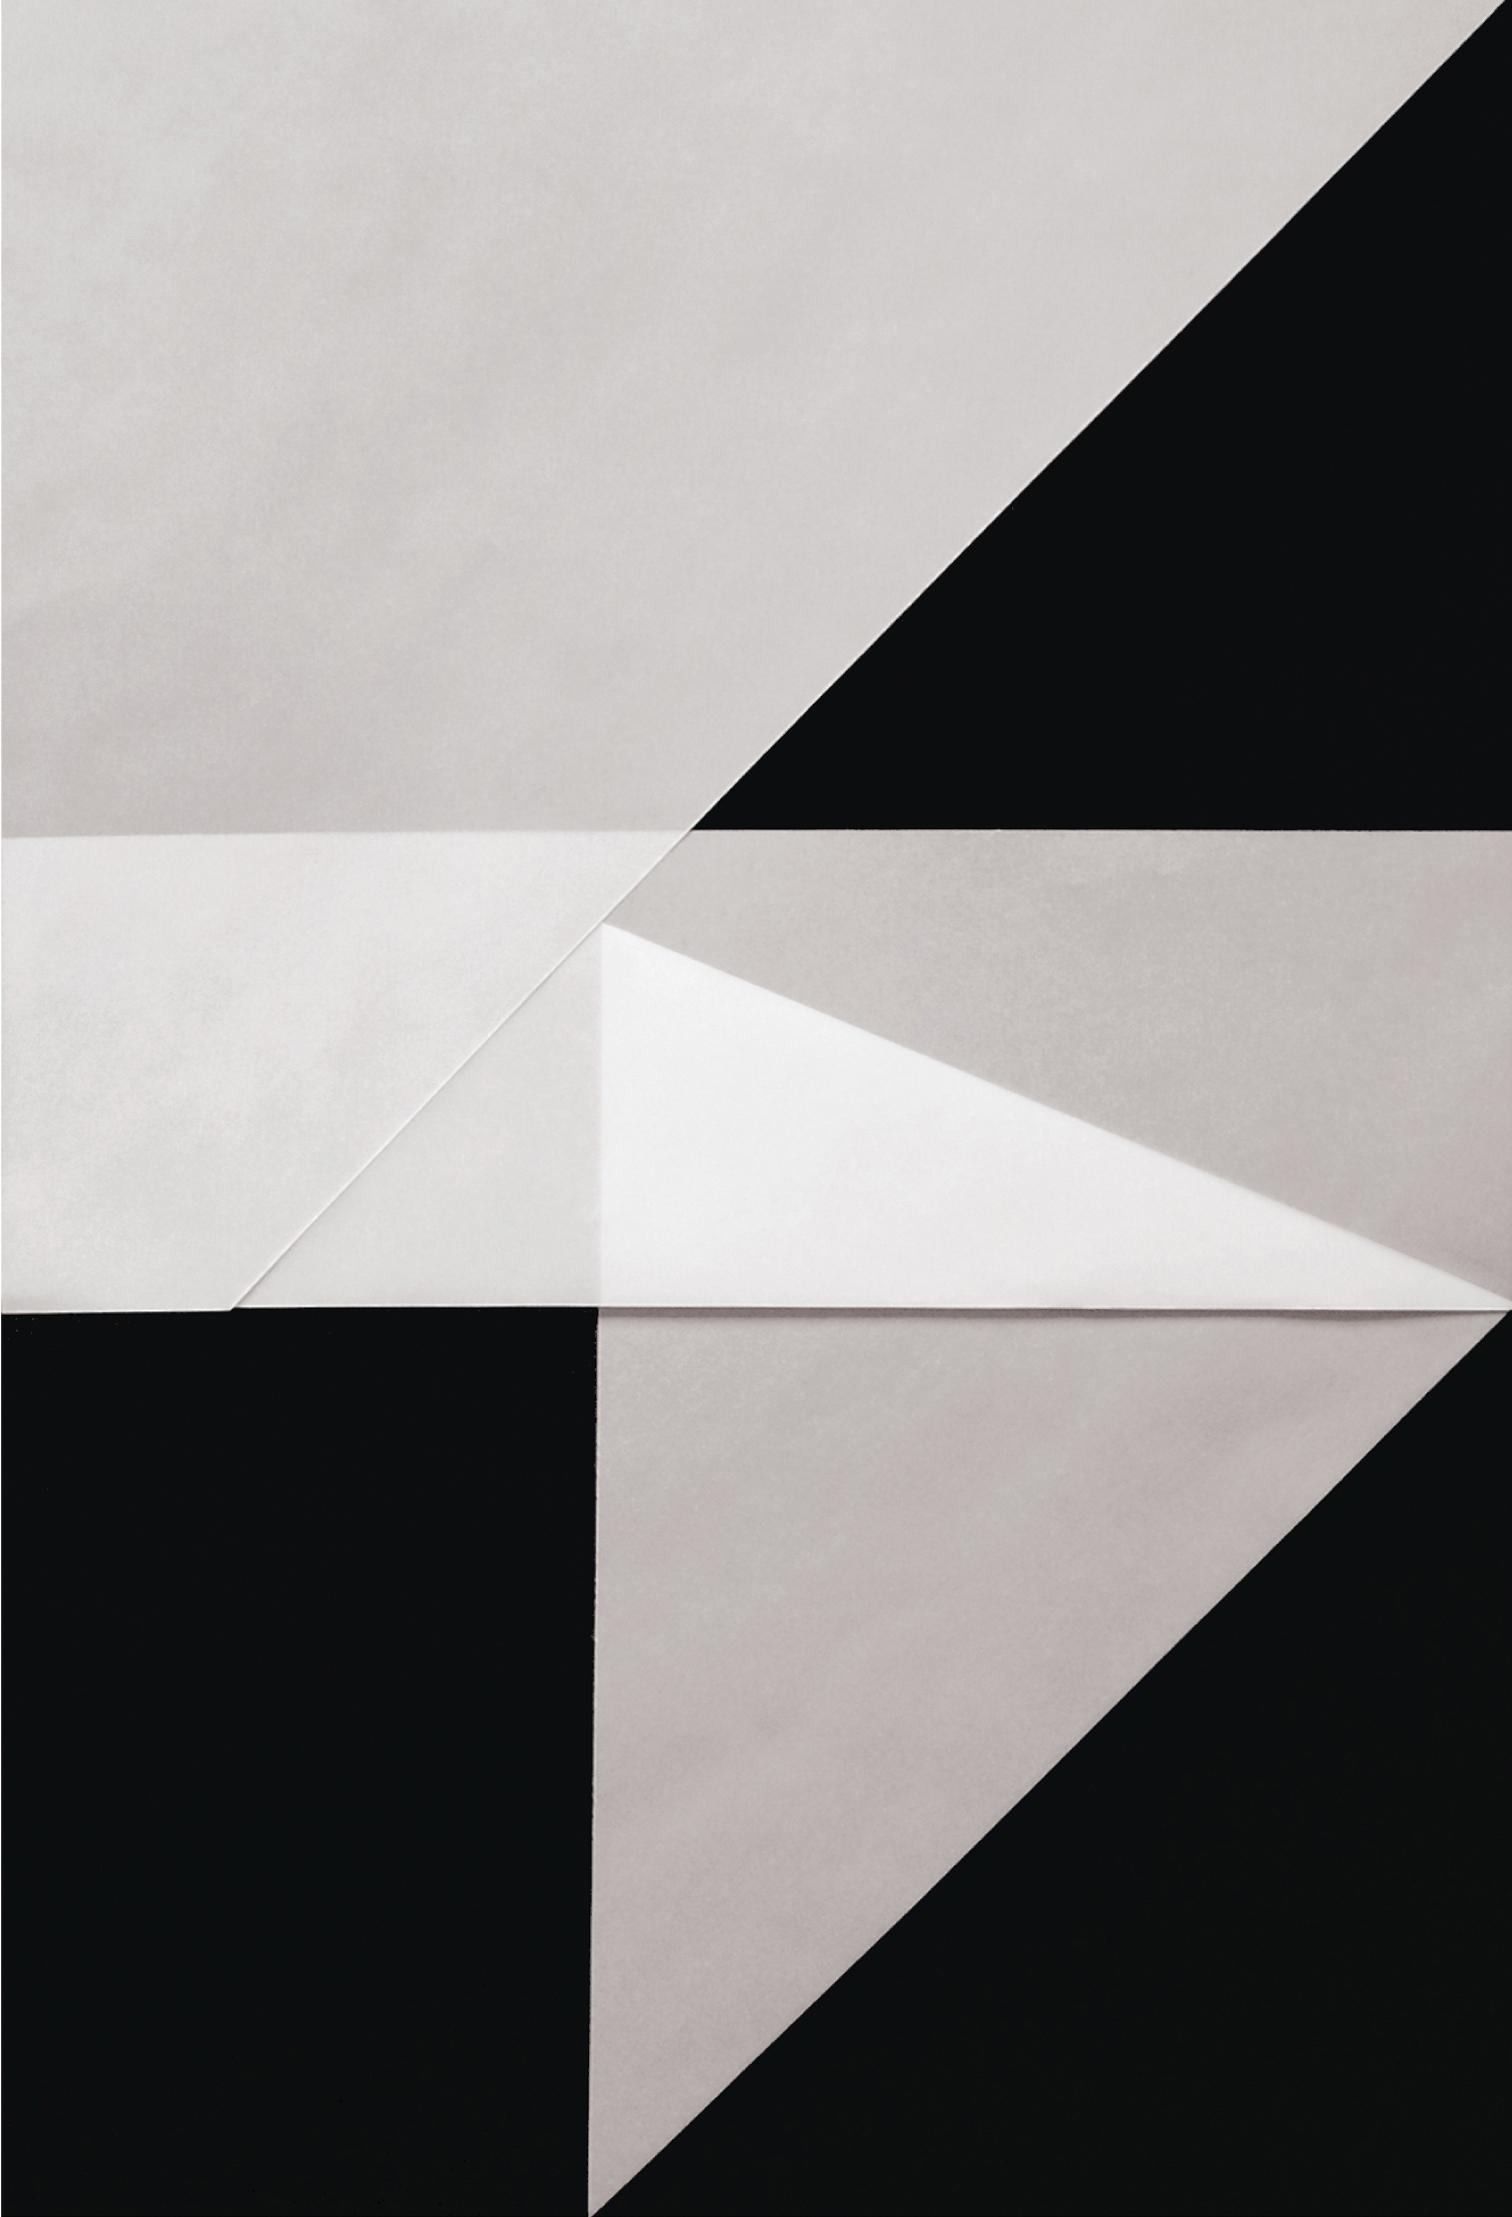 6. motiv, 80 x 60 cm, pergamentbg. gefaltet